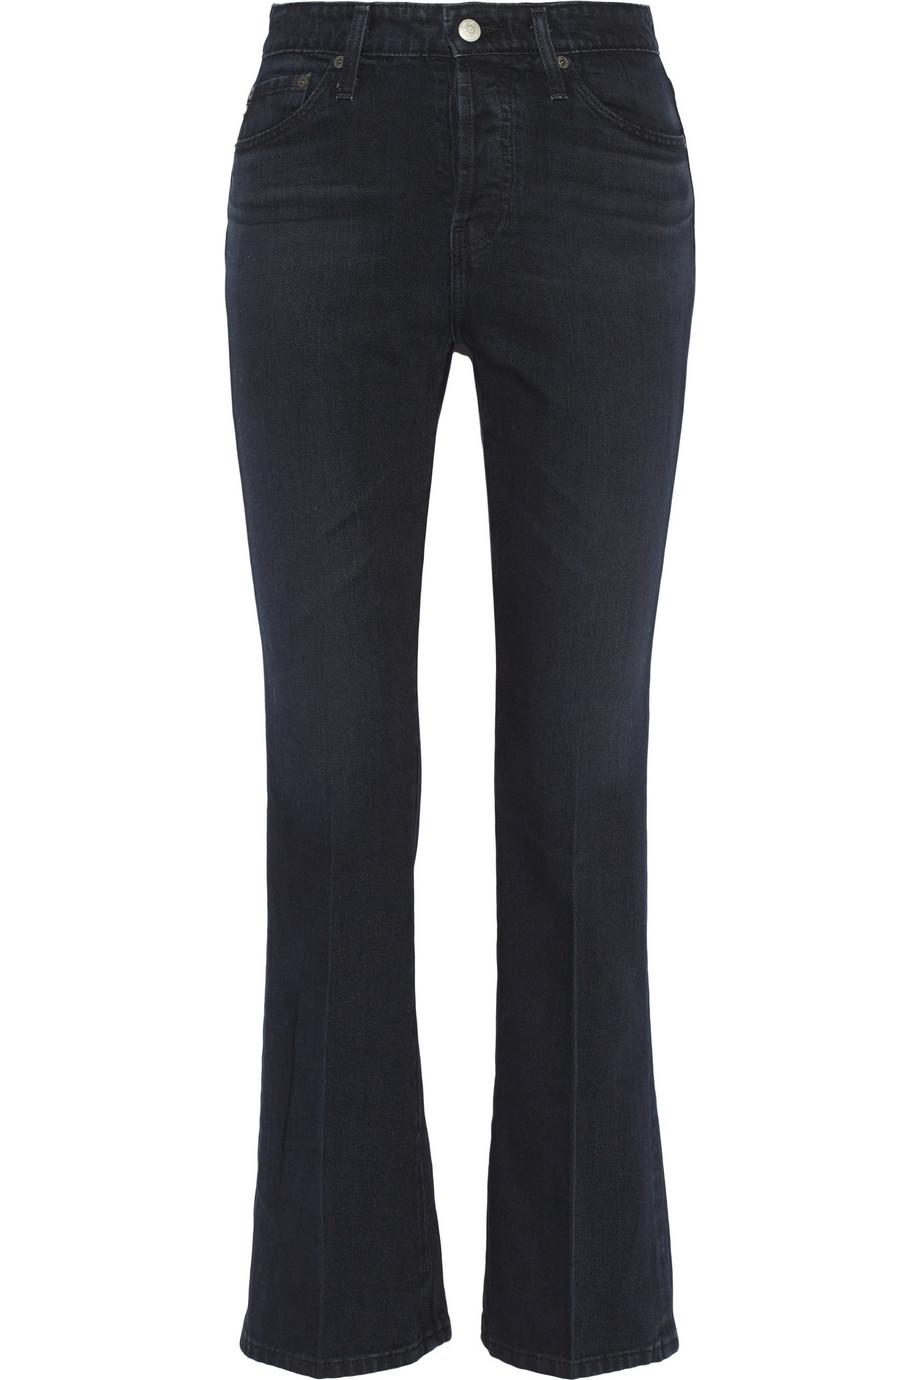 ag jeans alexa chung flared denim